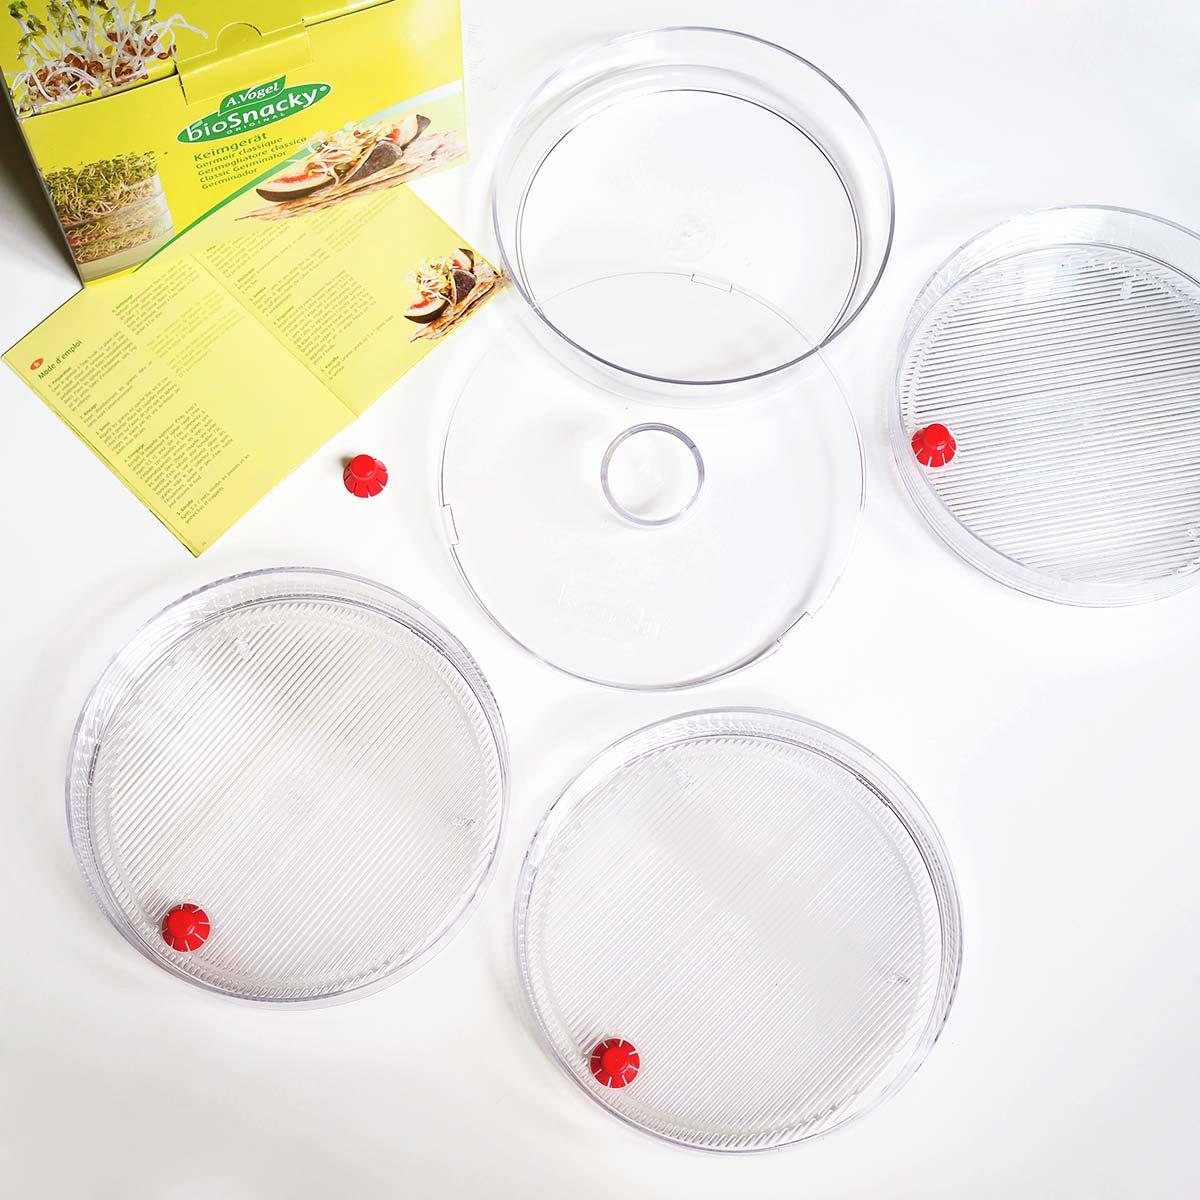 germoir germinator Biosnacky Avogel laboutiquedemelimelo